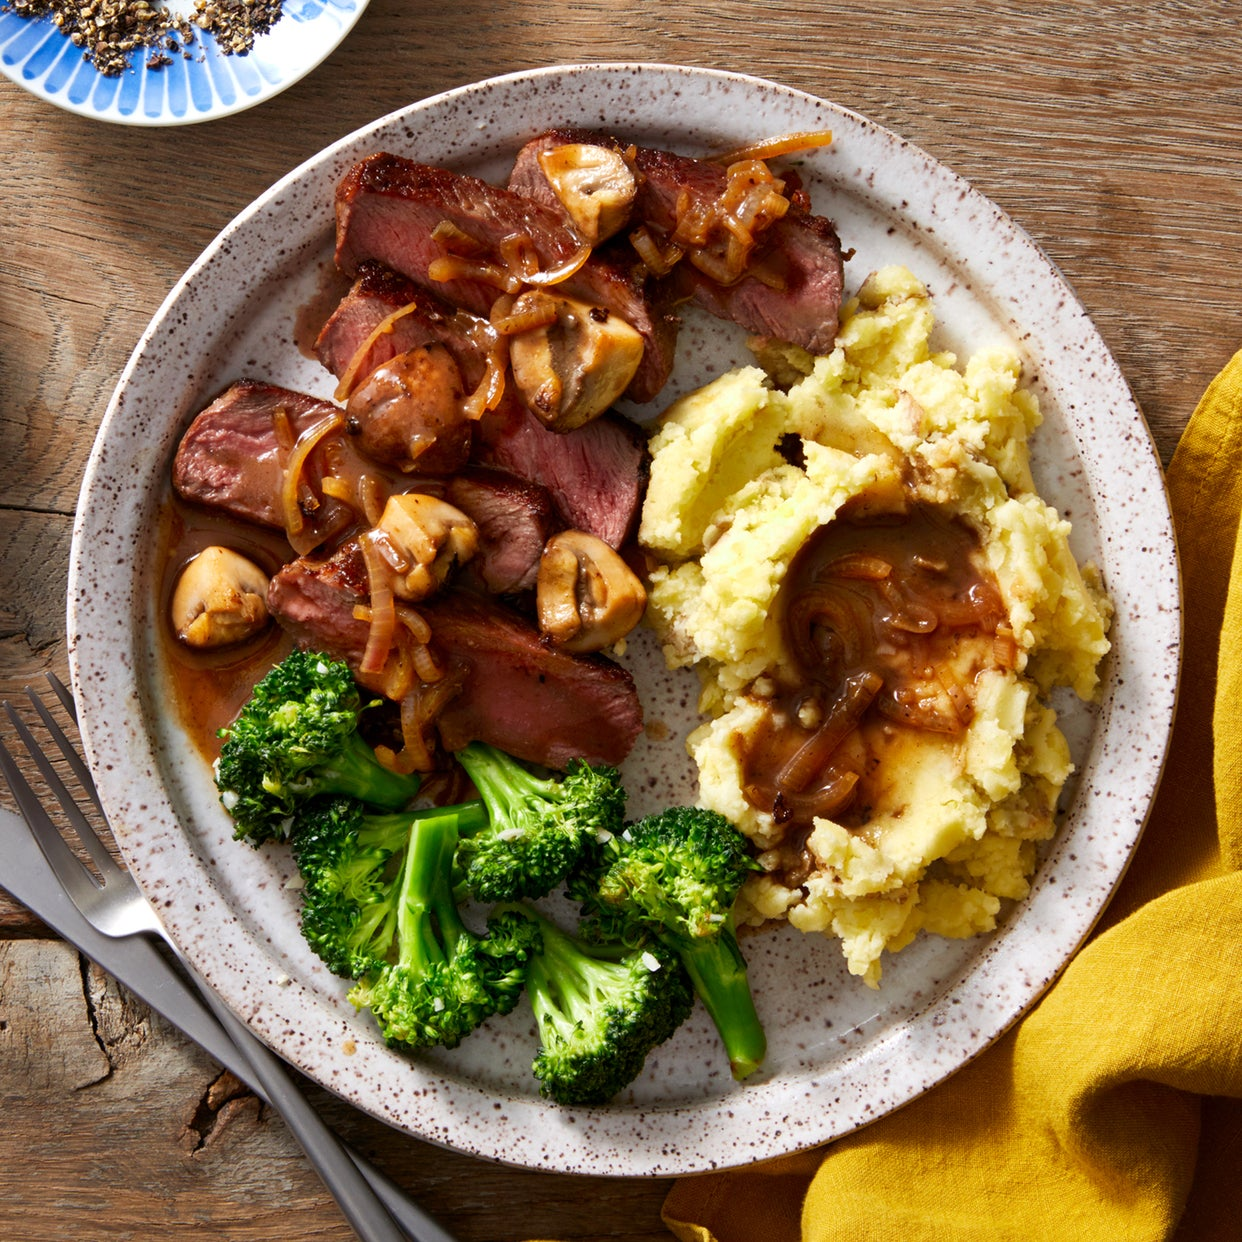 Top Chef Steak & Mushroom Sauce with Mashed Potatoes & Broccoli